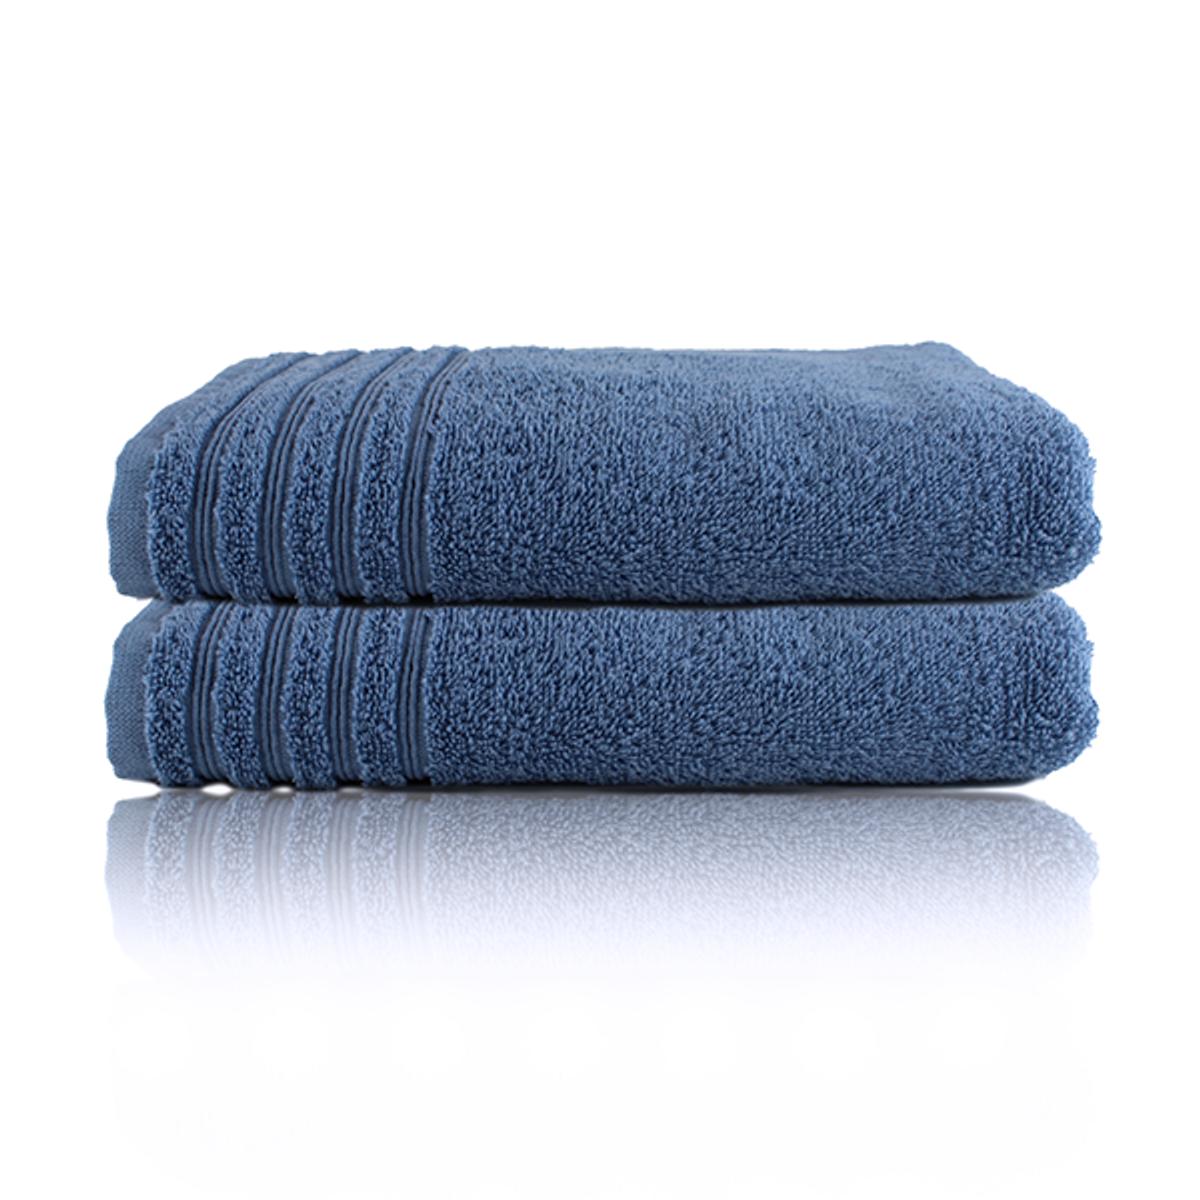 Home Stellebord håndkle 2pk. | Dusty Blue